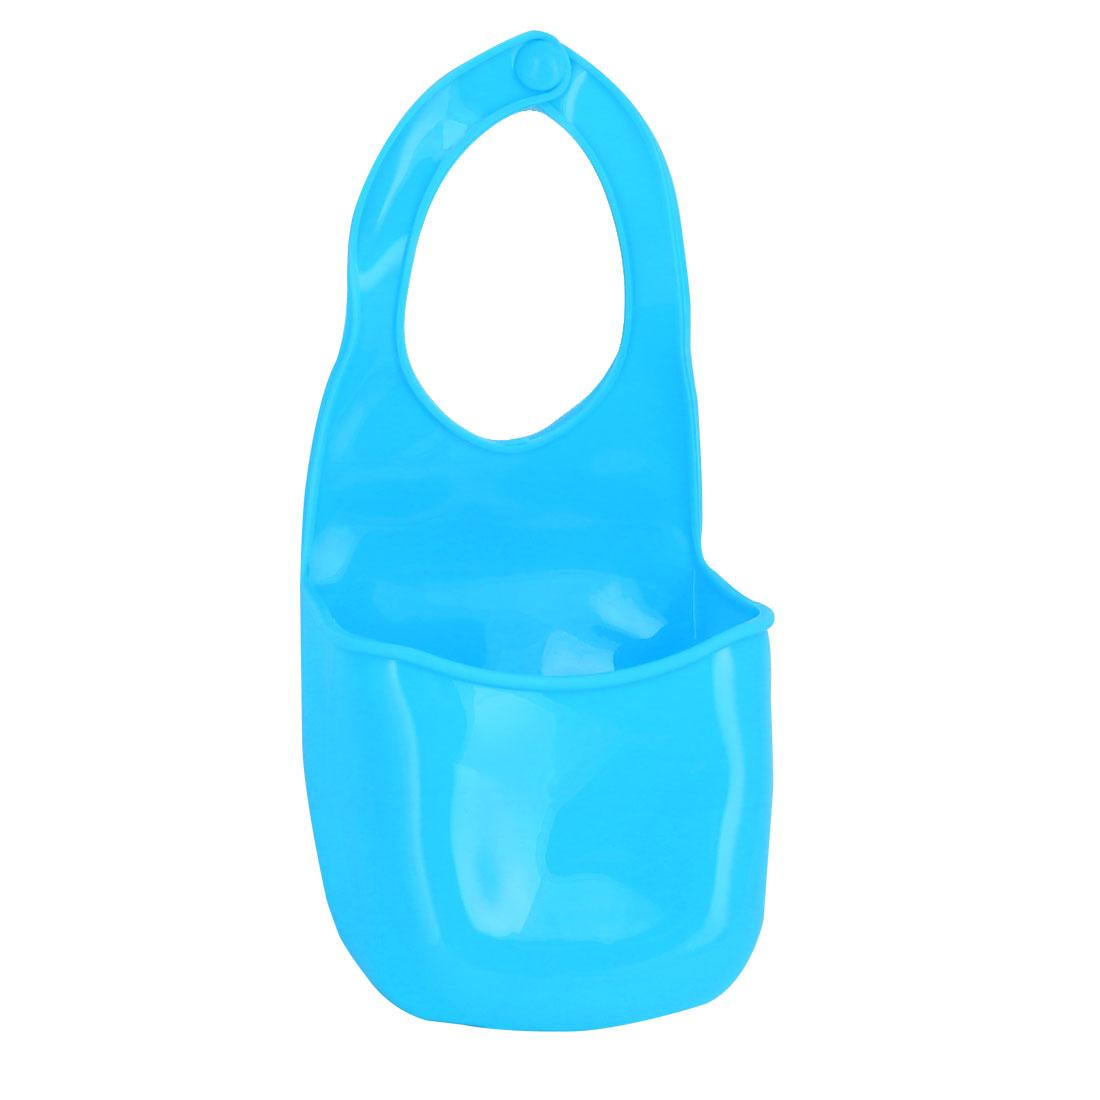 Bathroom Wall Door Silicone 3 Holes Design Hanging Storage Bag Case Organizer Blue